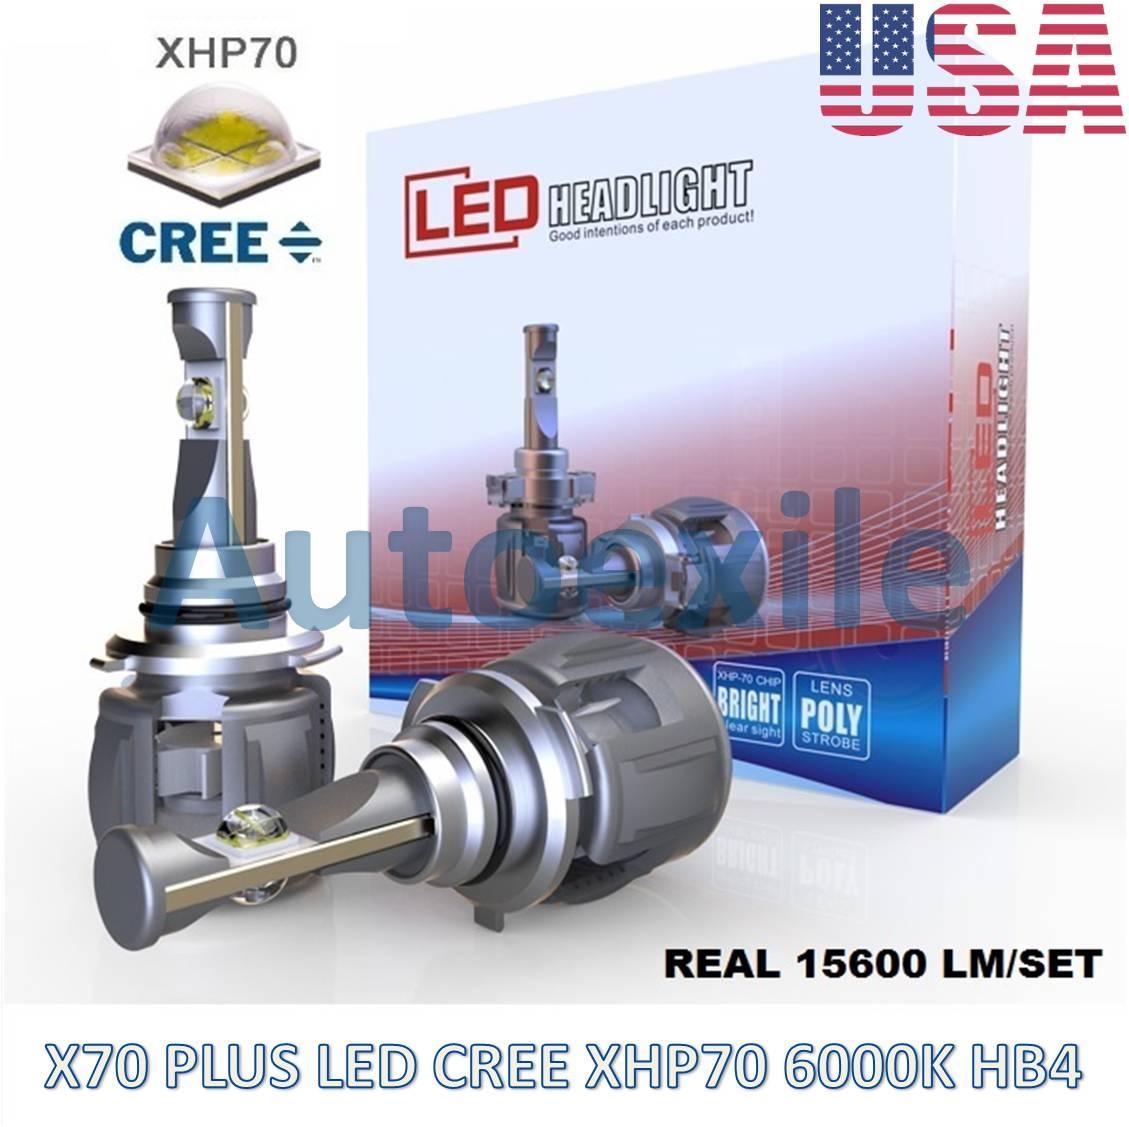 X70 Plus LED HB4 9006 60W 15600LM CREE XHP70 6000K Lampu Mobil Putih XHP 70 Avanza Fortuner CRV Innova